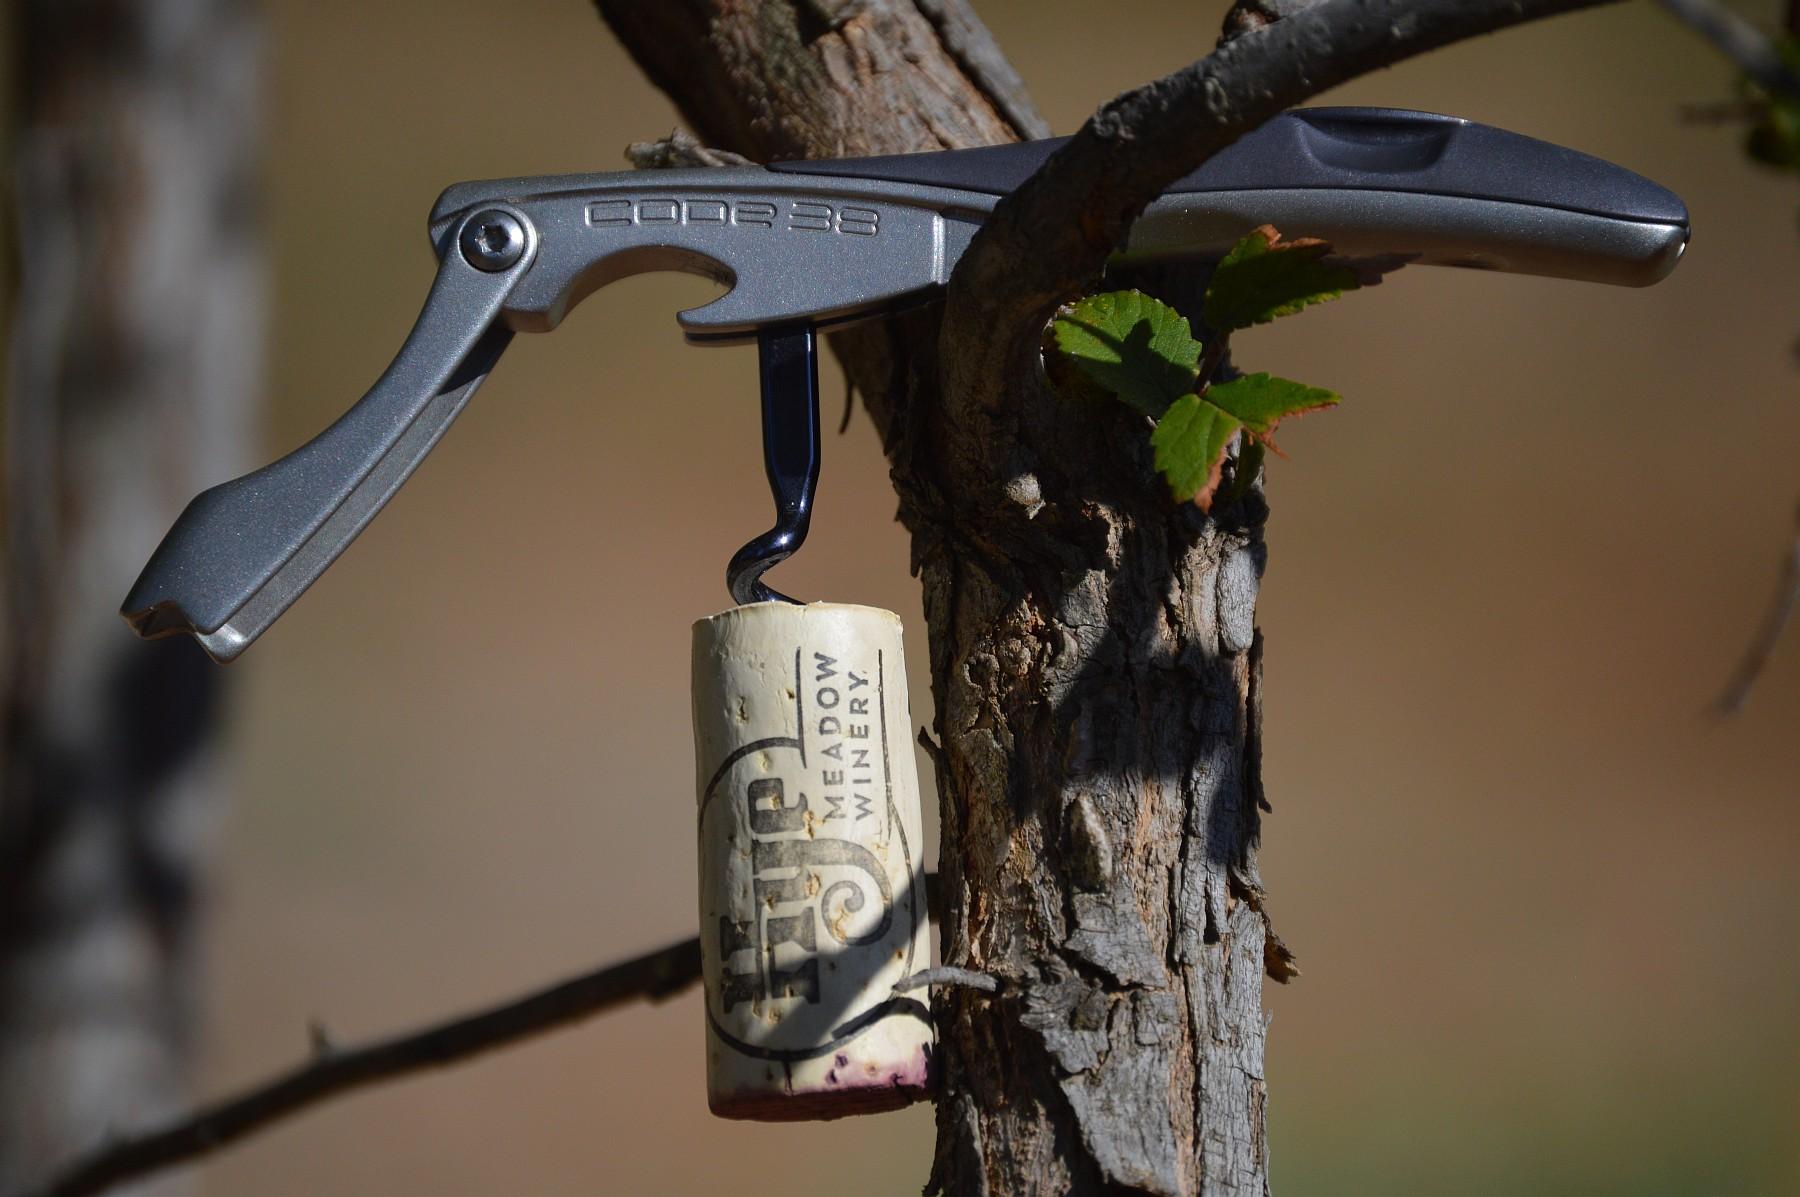 Hye Meadow Tempranillo cork